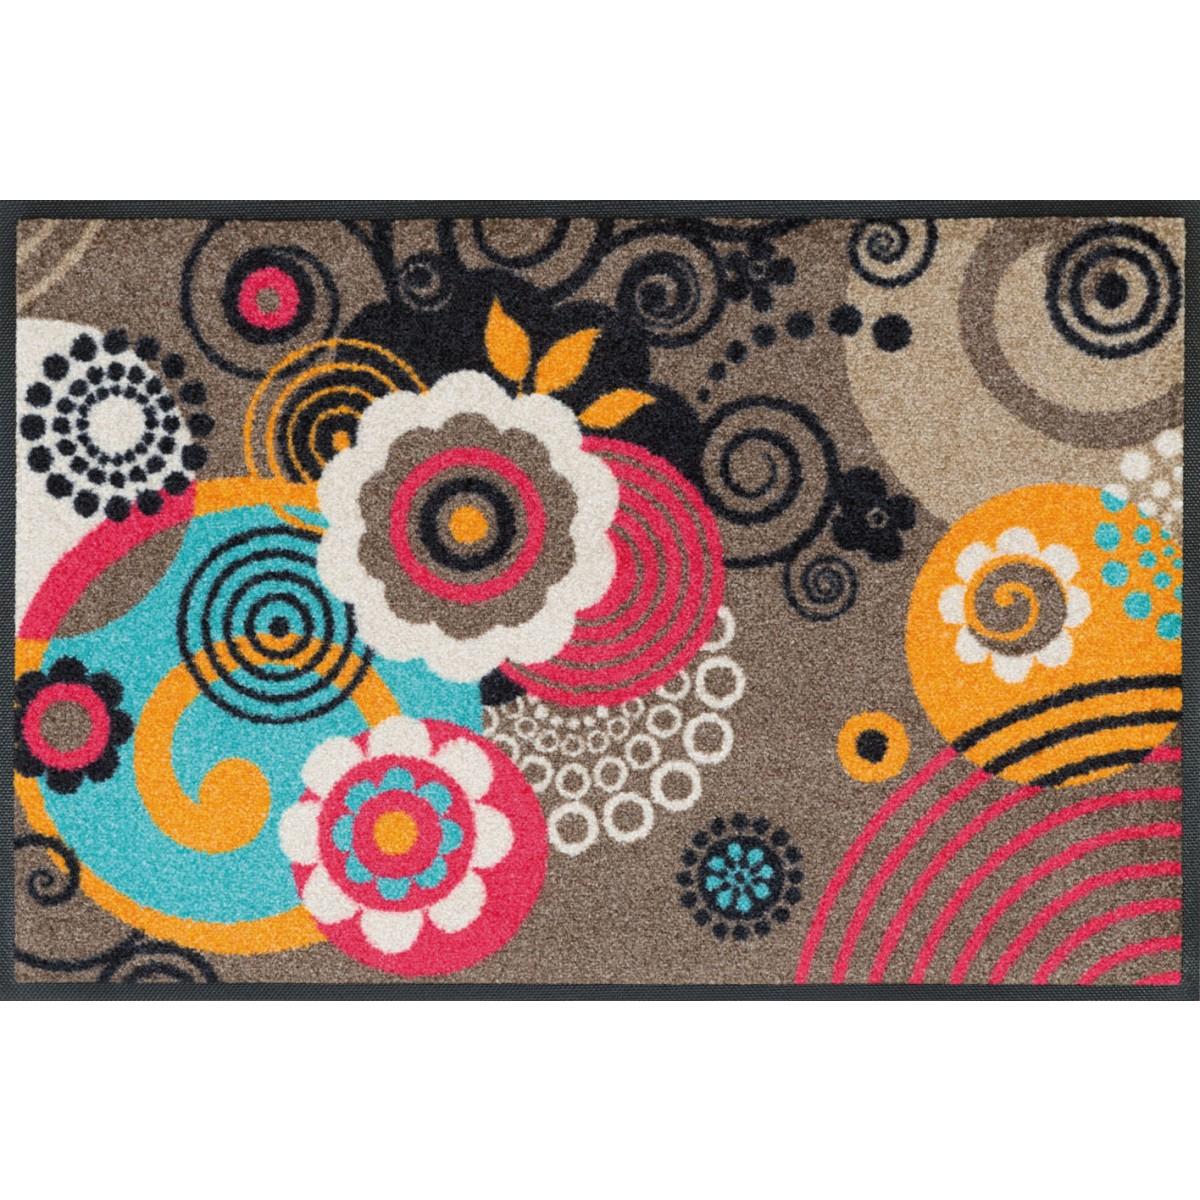 wash dry fu matte loops and flowers taupe kaufen verschiedene gr en mattenkiste. Black Bedroom Furniture Sets. Home Design Ideas